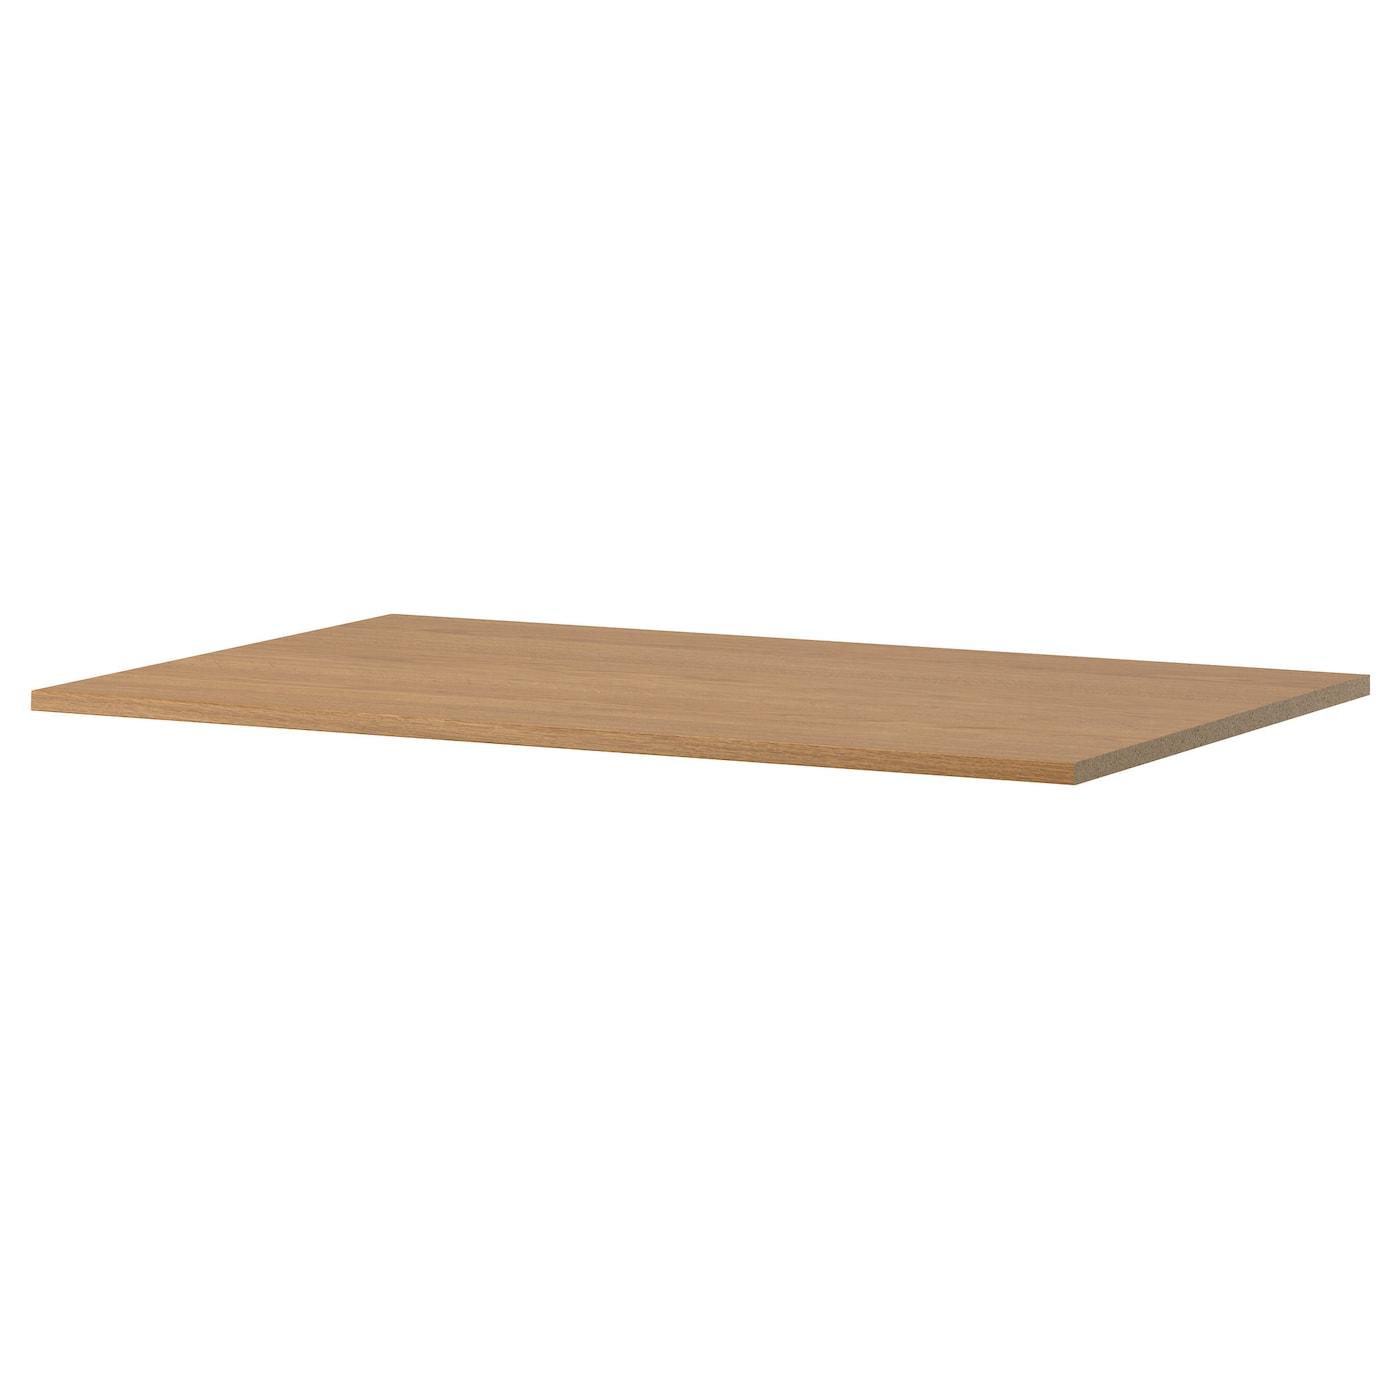 komplement shelf oak effect 100 x 58 cm ikea. Black Bedroom Furniture Sets. Home Design Ideas